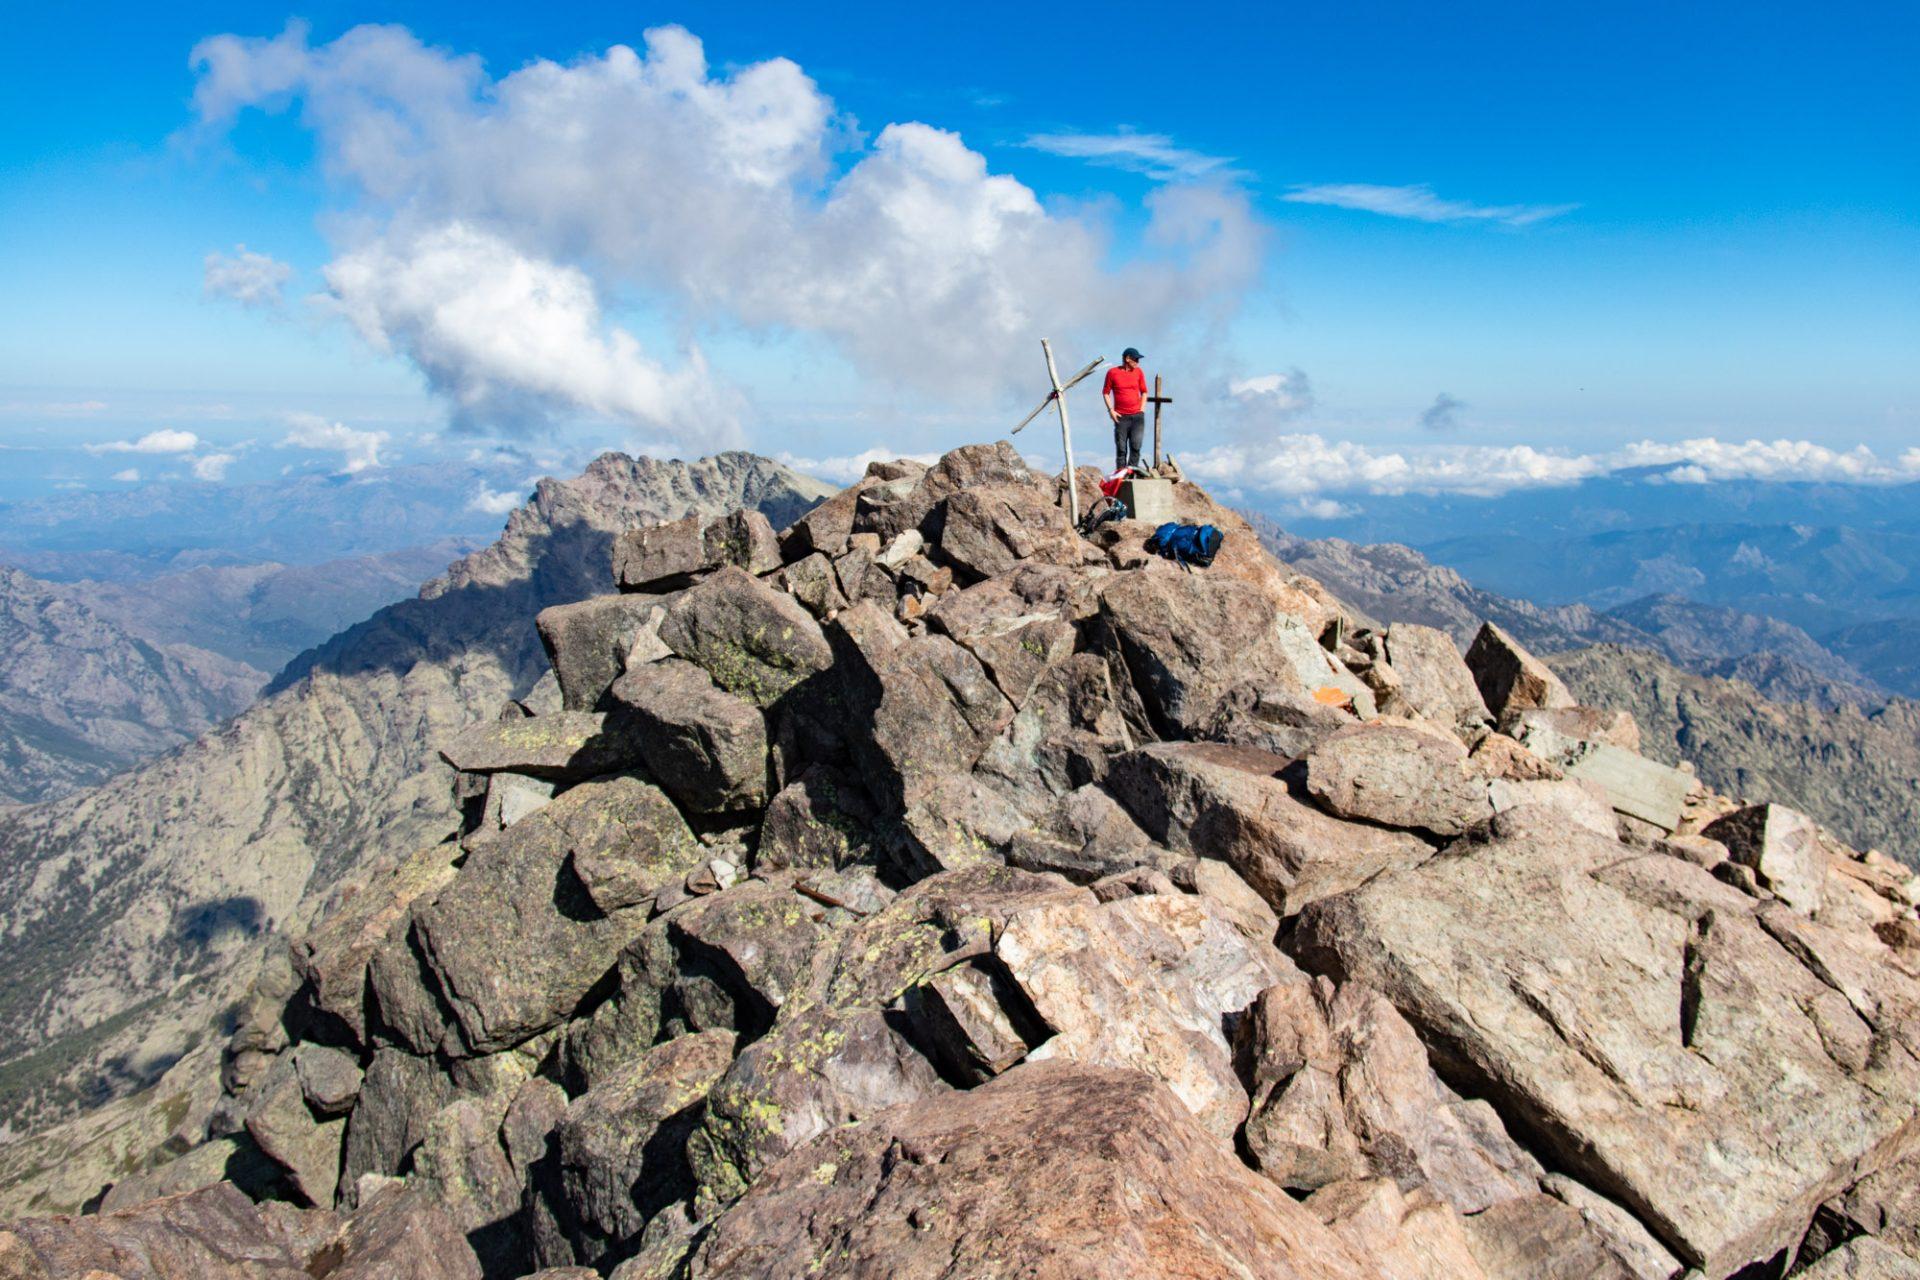 Beklimming van de Monte Cinto